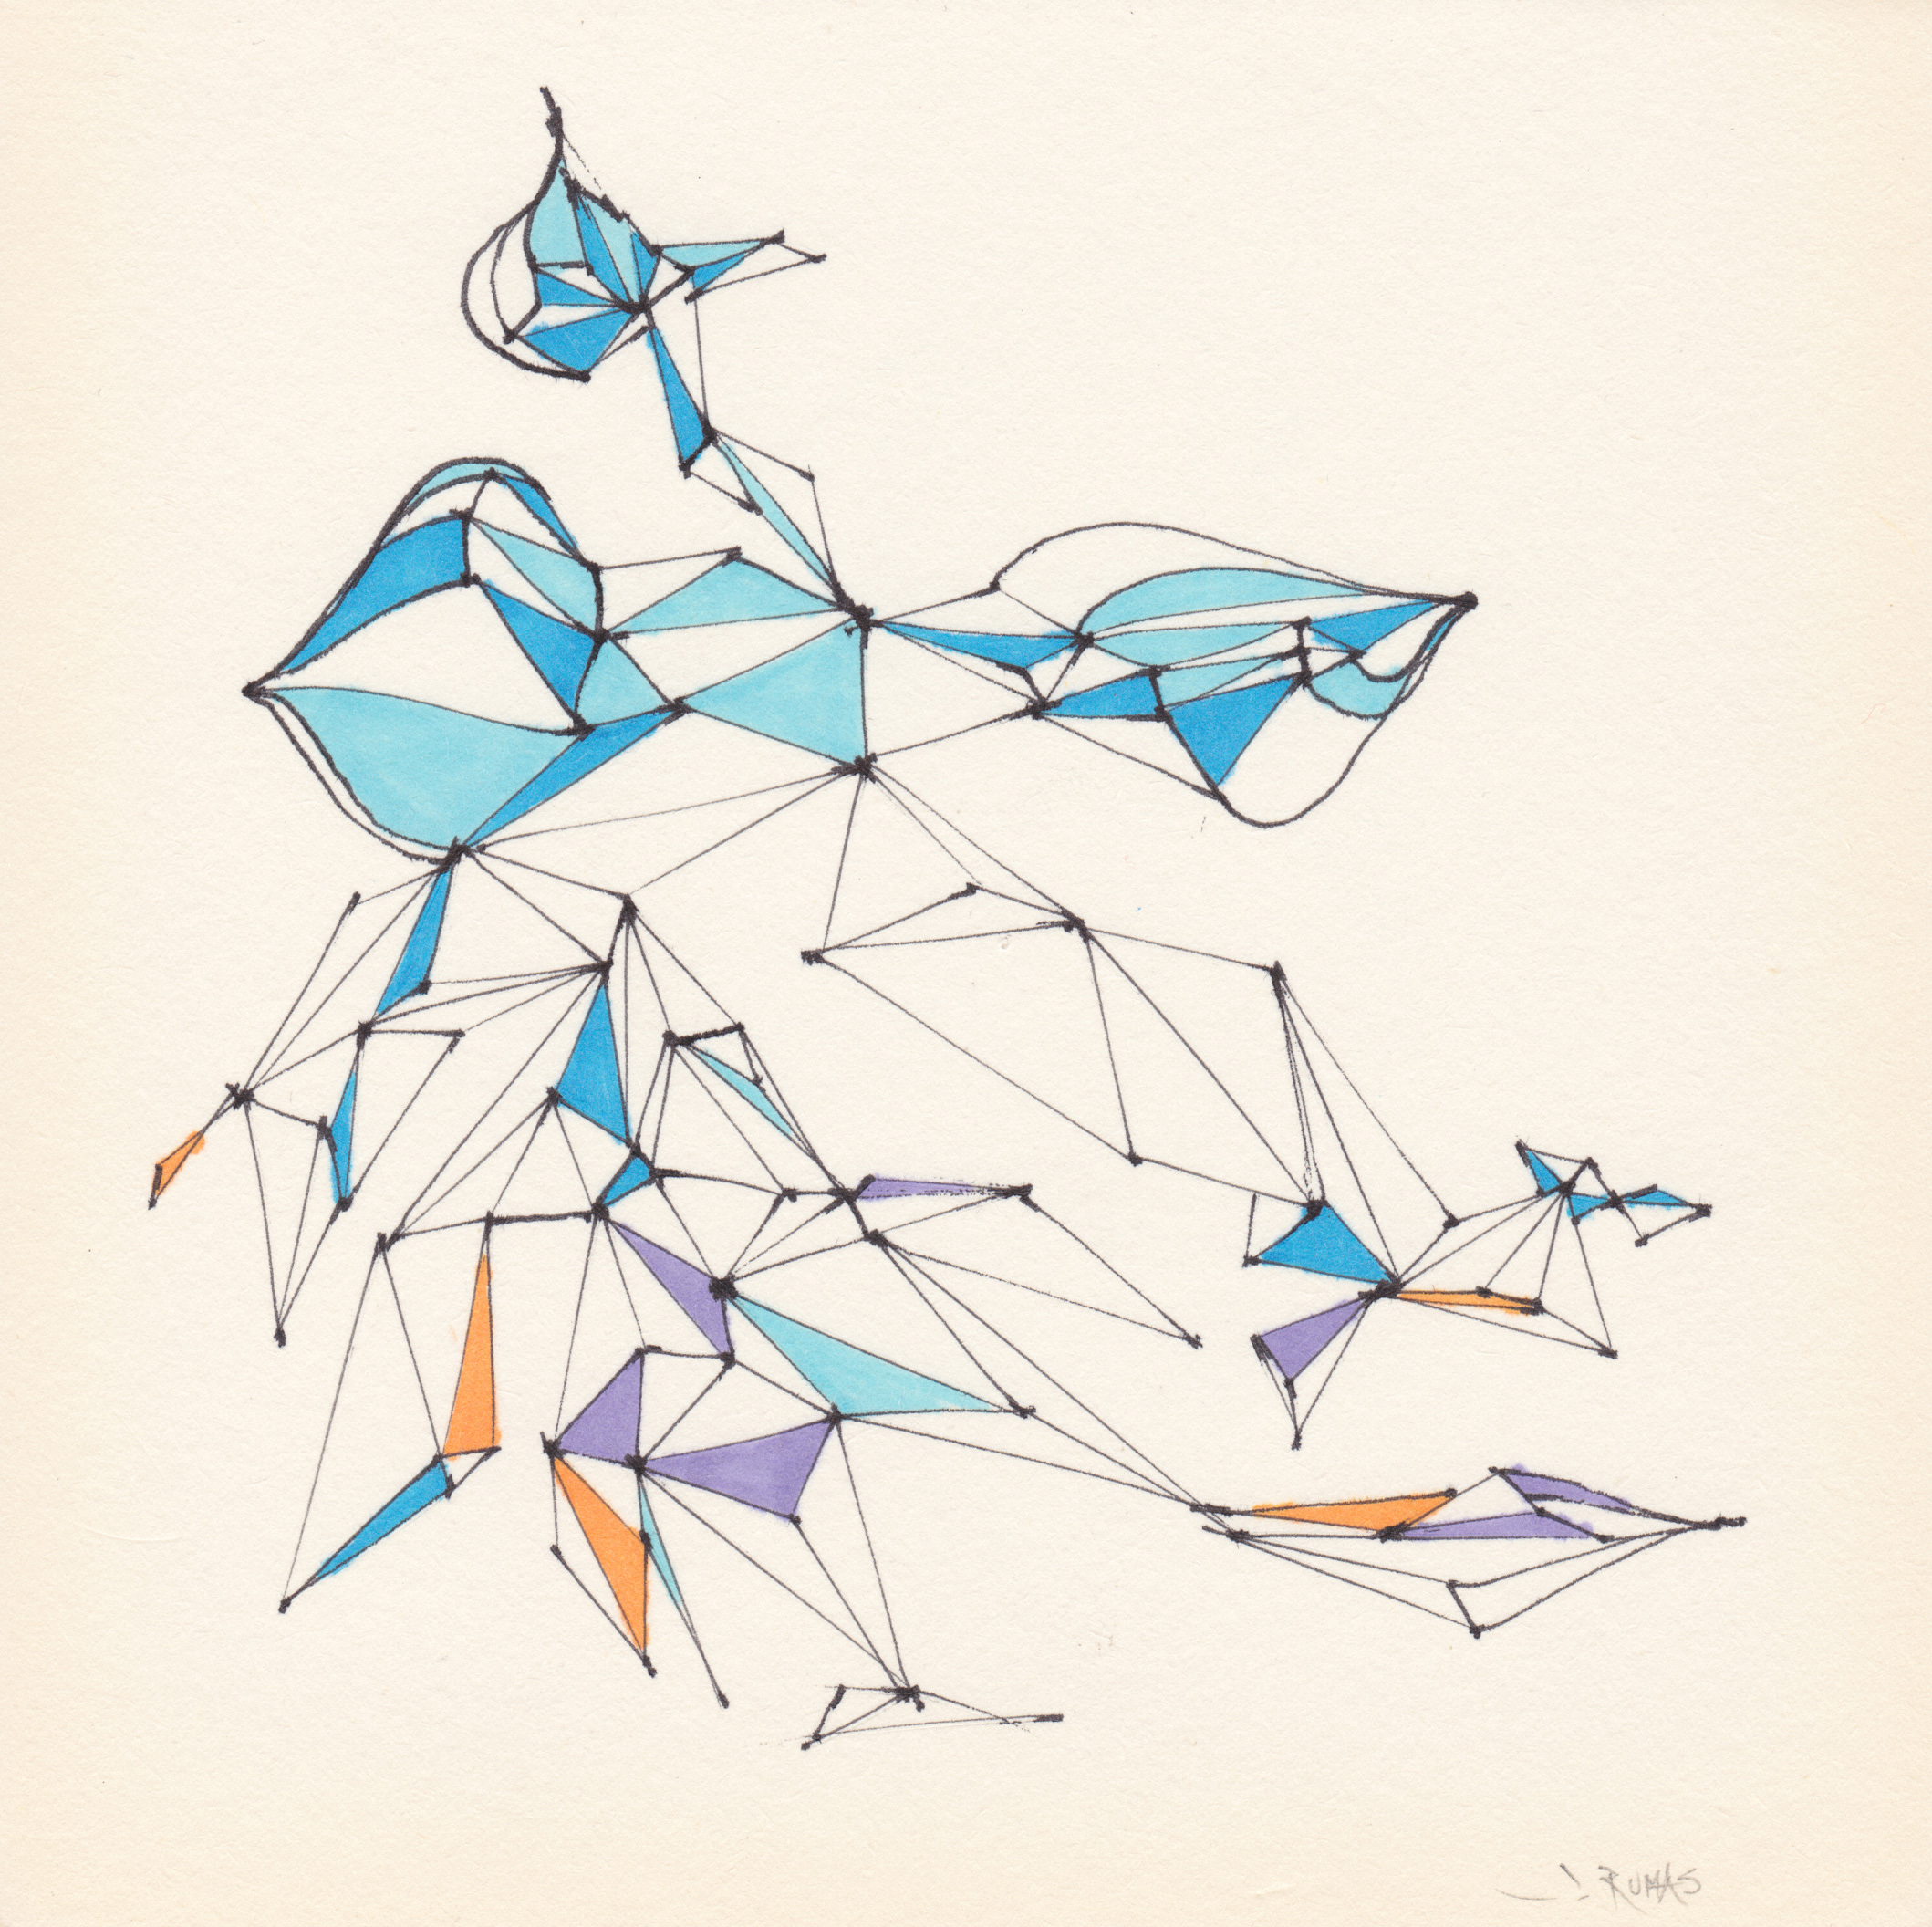 JEREMY RUMAS ART + PEN and MARKER SKETCHES 01 + abstract futurism + modern art +www.jeremyrumas.com.jpeg